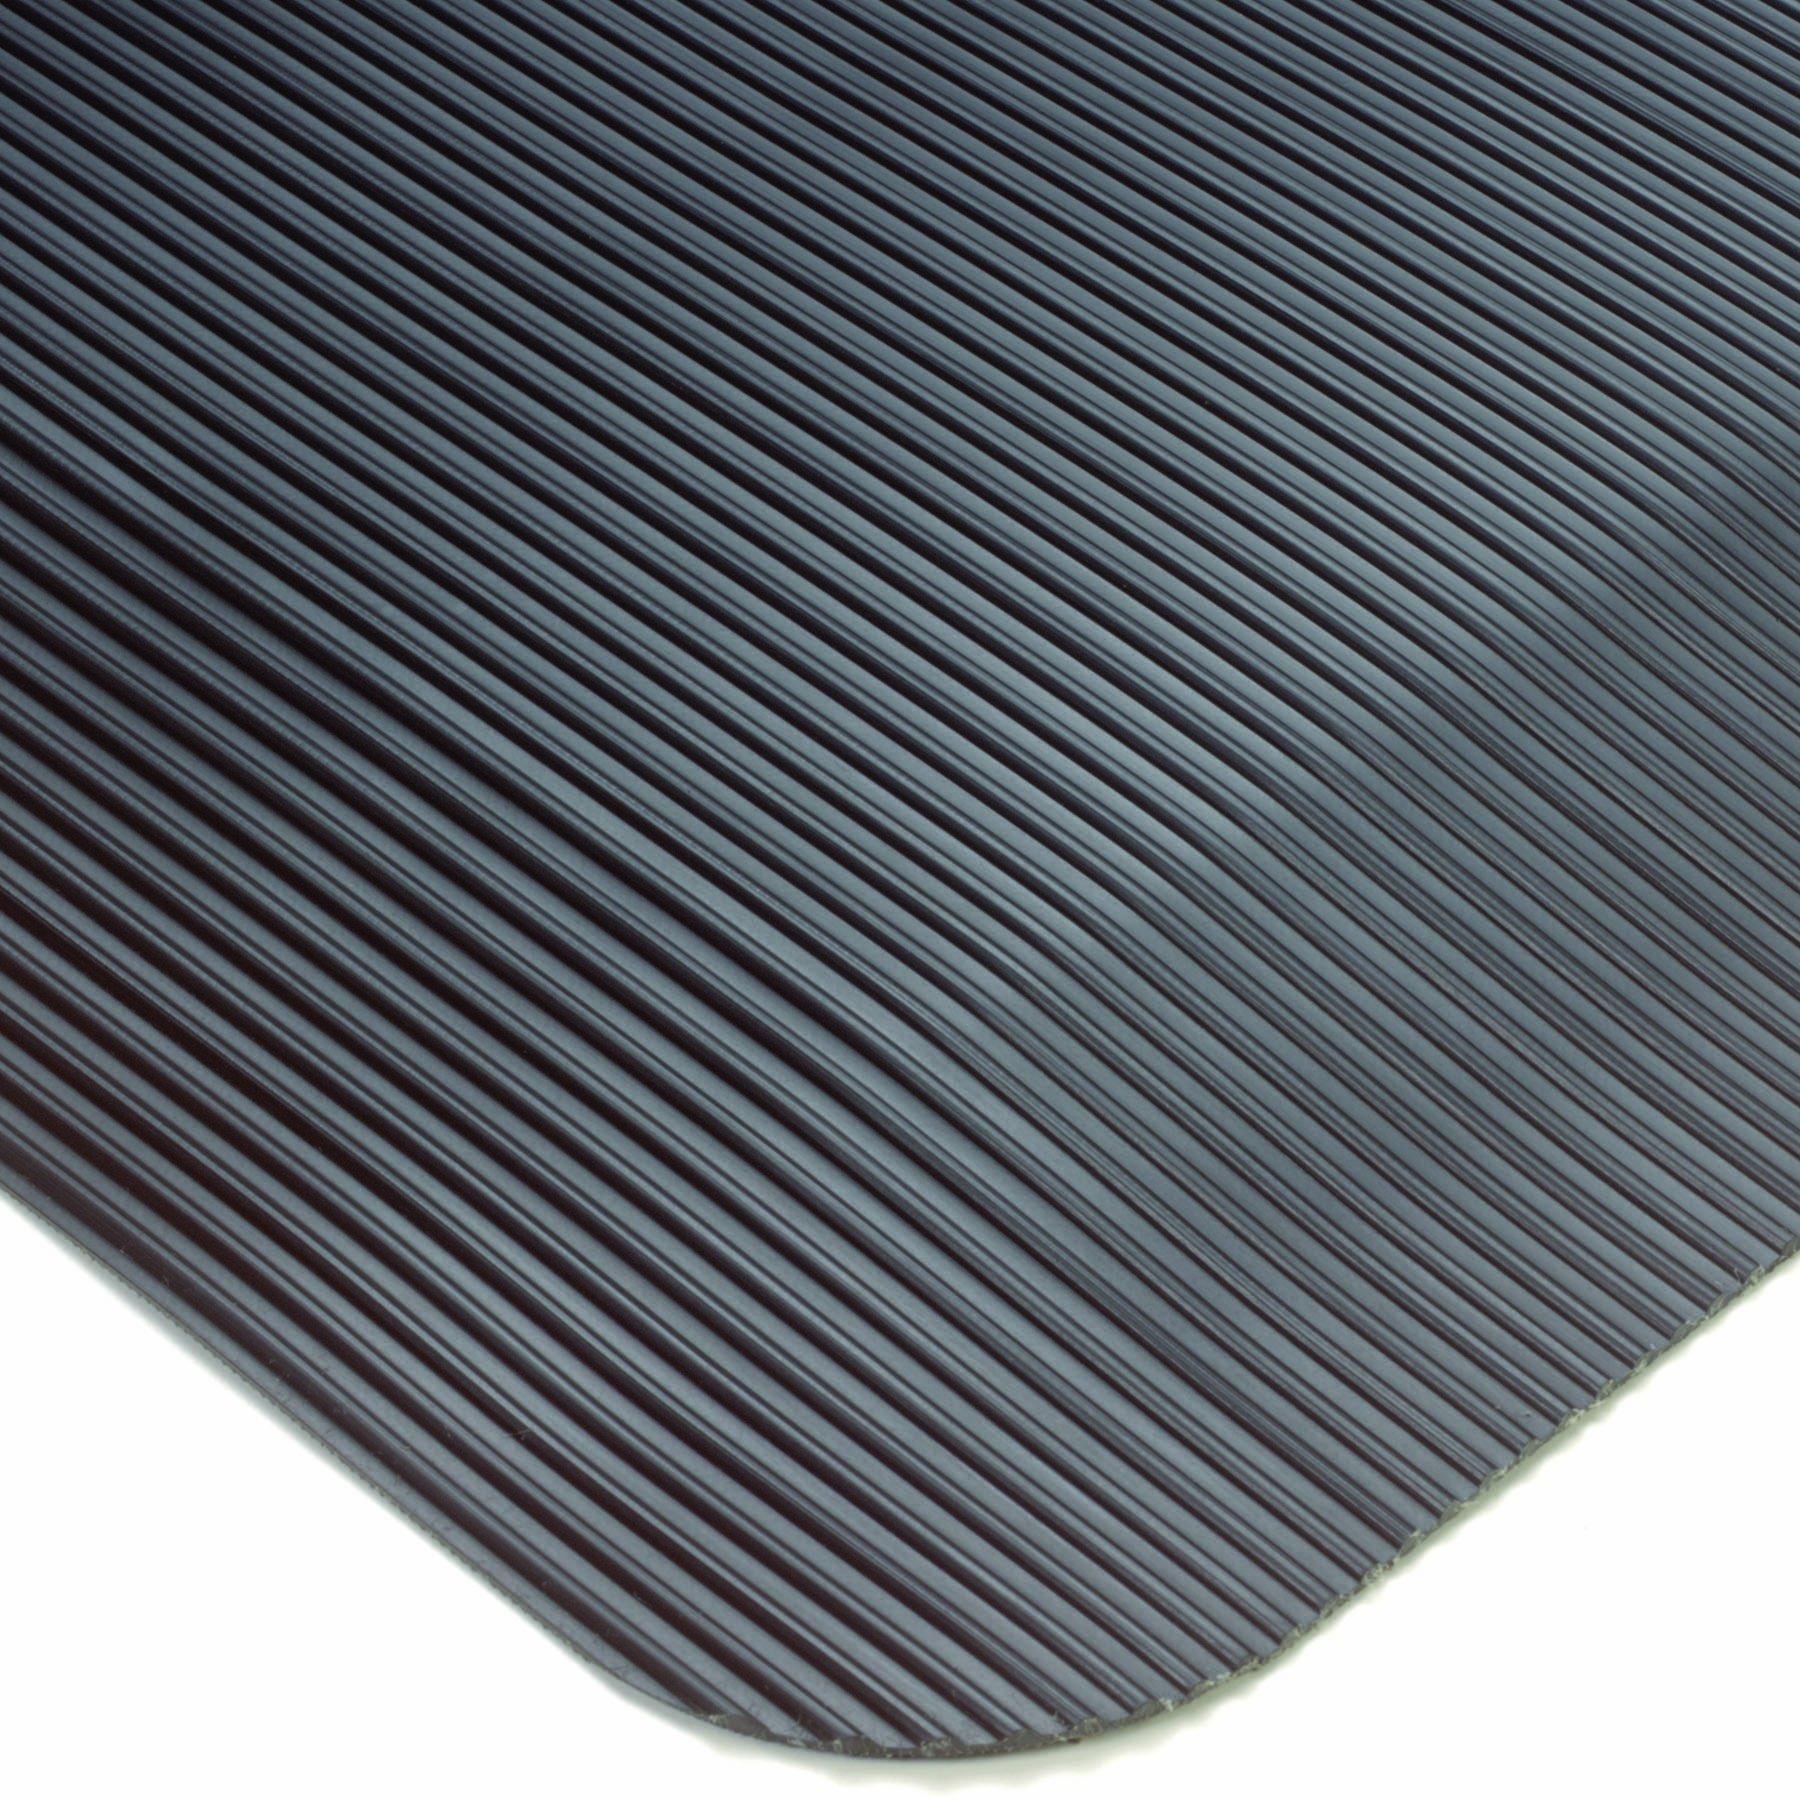 Wearwell PVC 433 ComfortPro Medium Duty Anti-Fatigue Beveled Mat, for Dry Areas, 2' Width x 3' Length x 1/2'' Thickness, Black